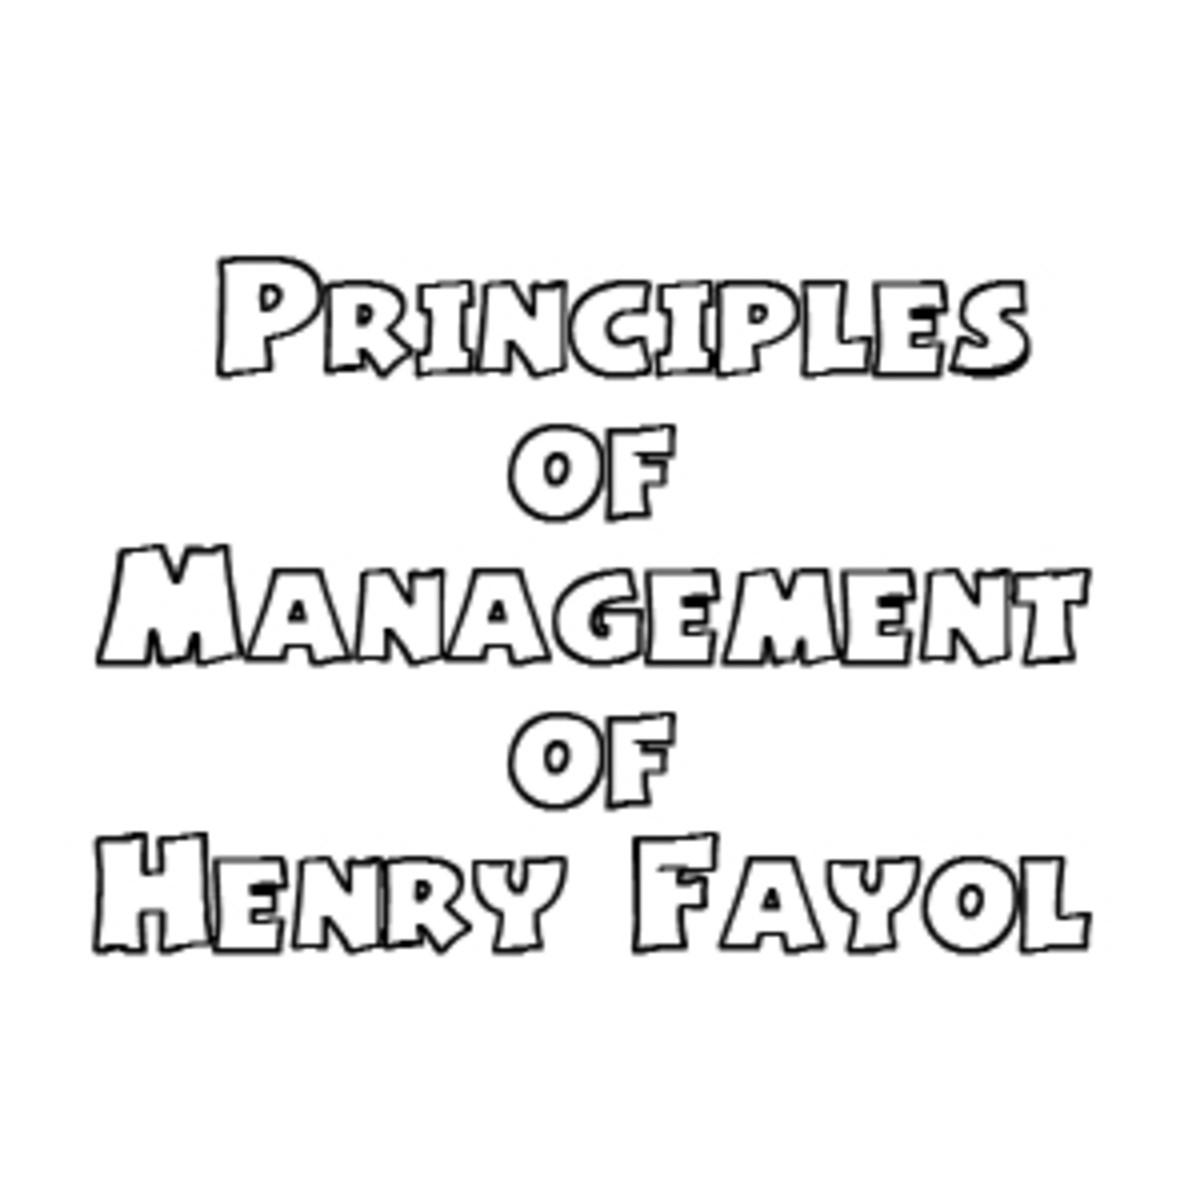 Henry Fayol 14 Principles of Management